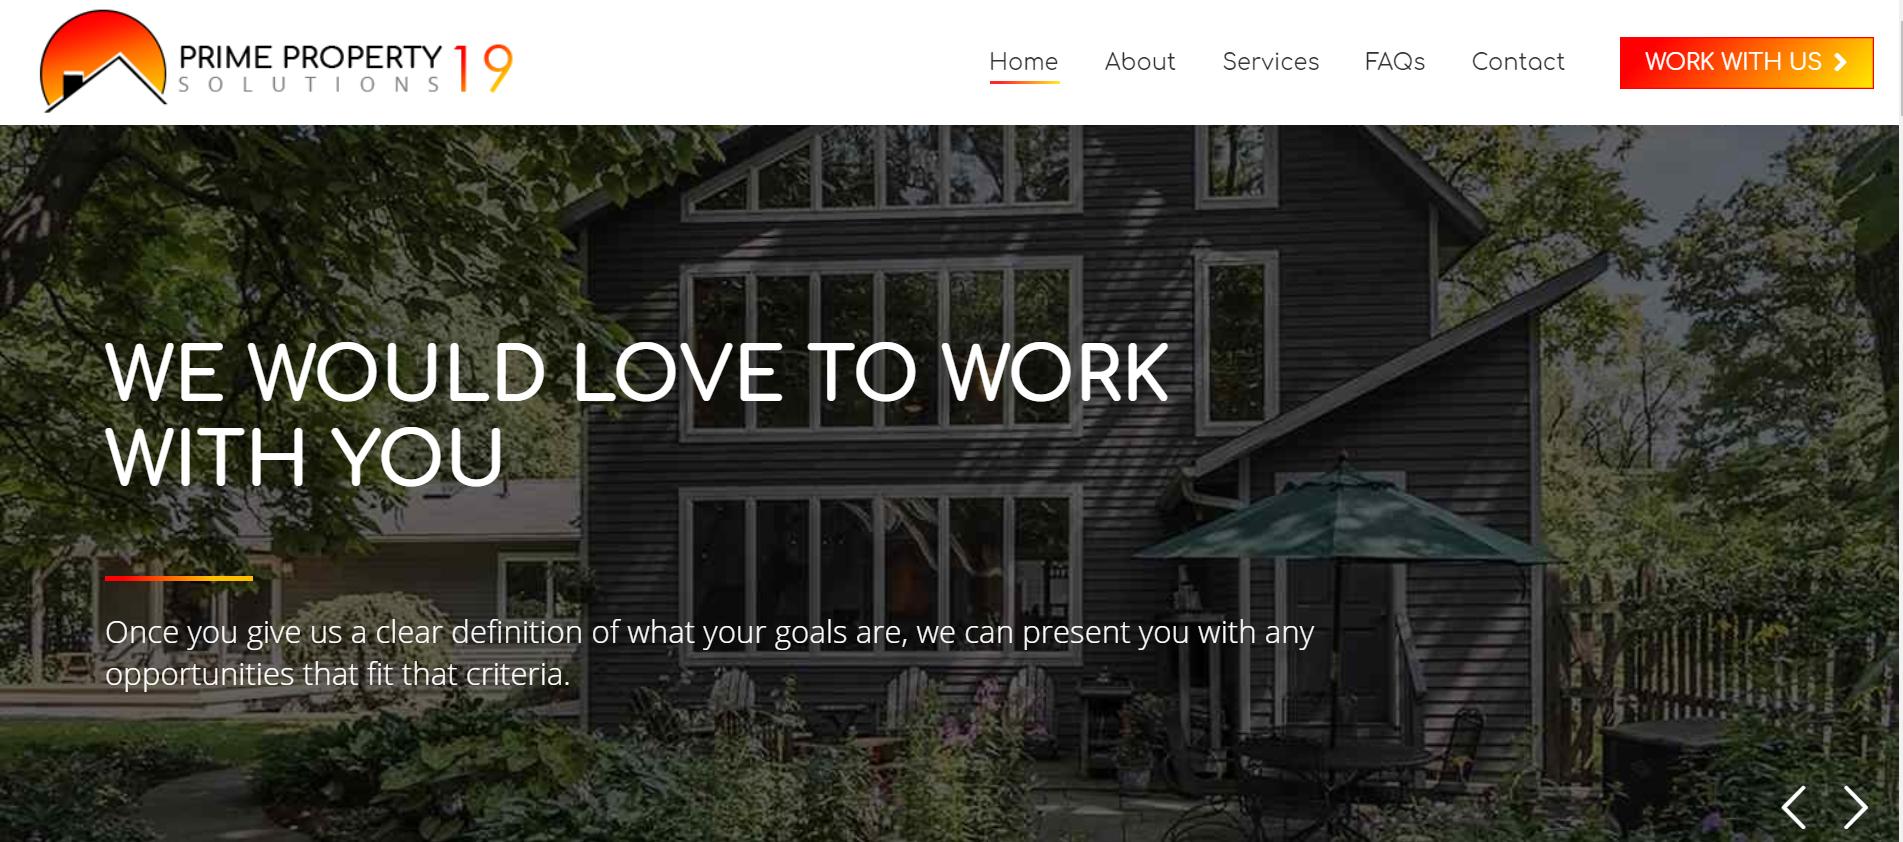 Prime Property Solutions 19 - Norfolk Web Design - Norfolk Web Development - Digital Marketing